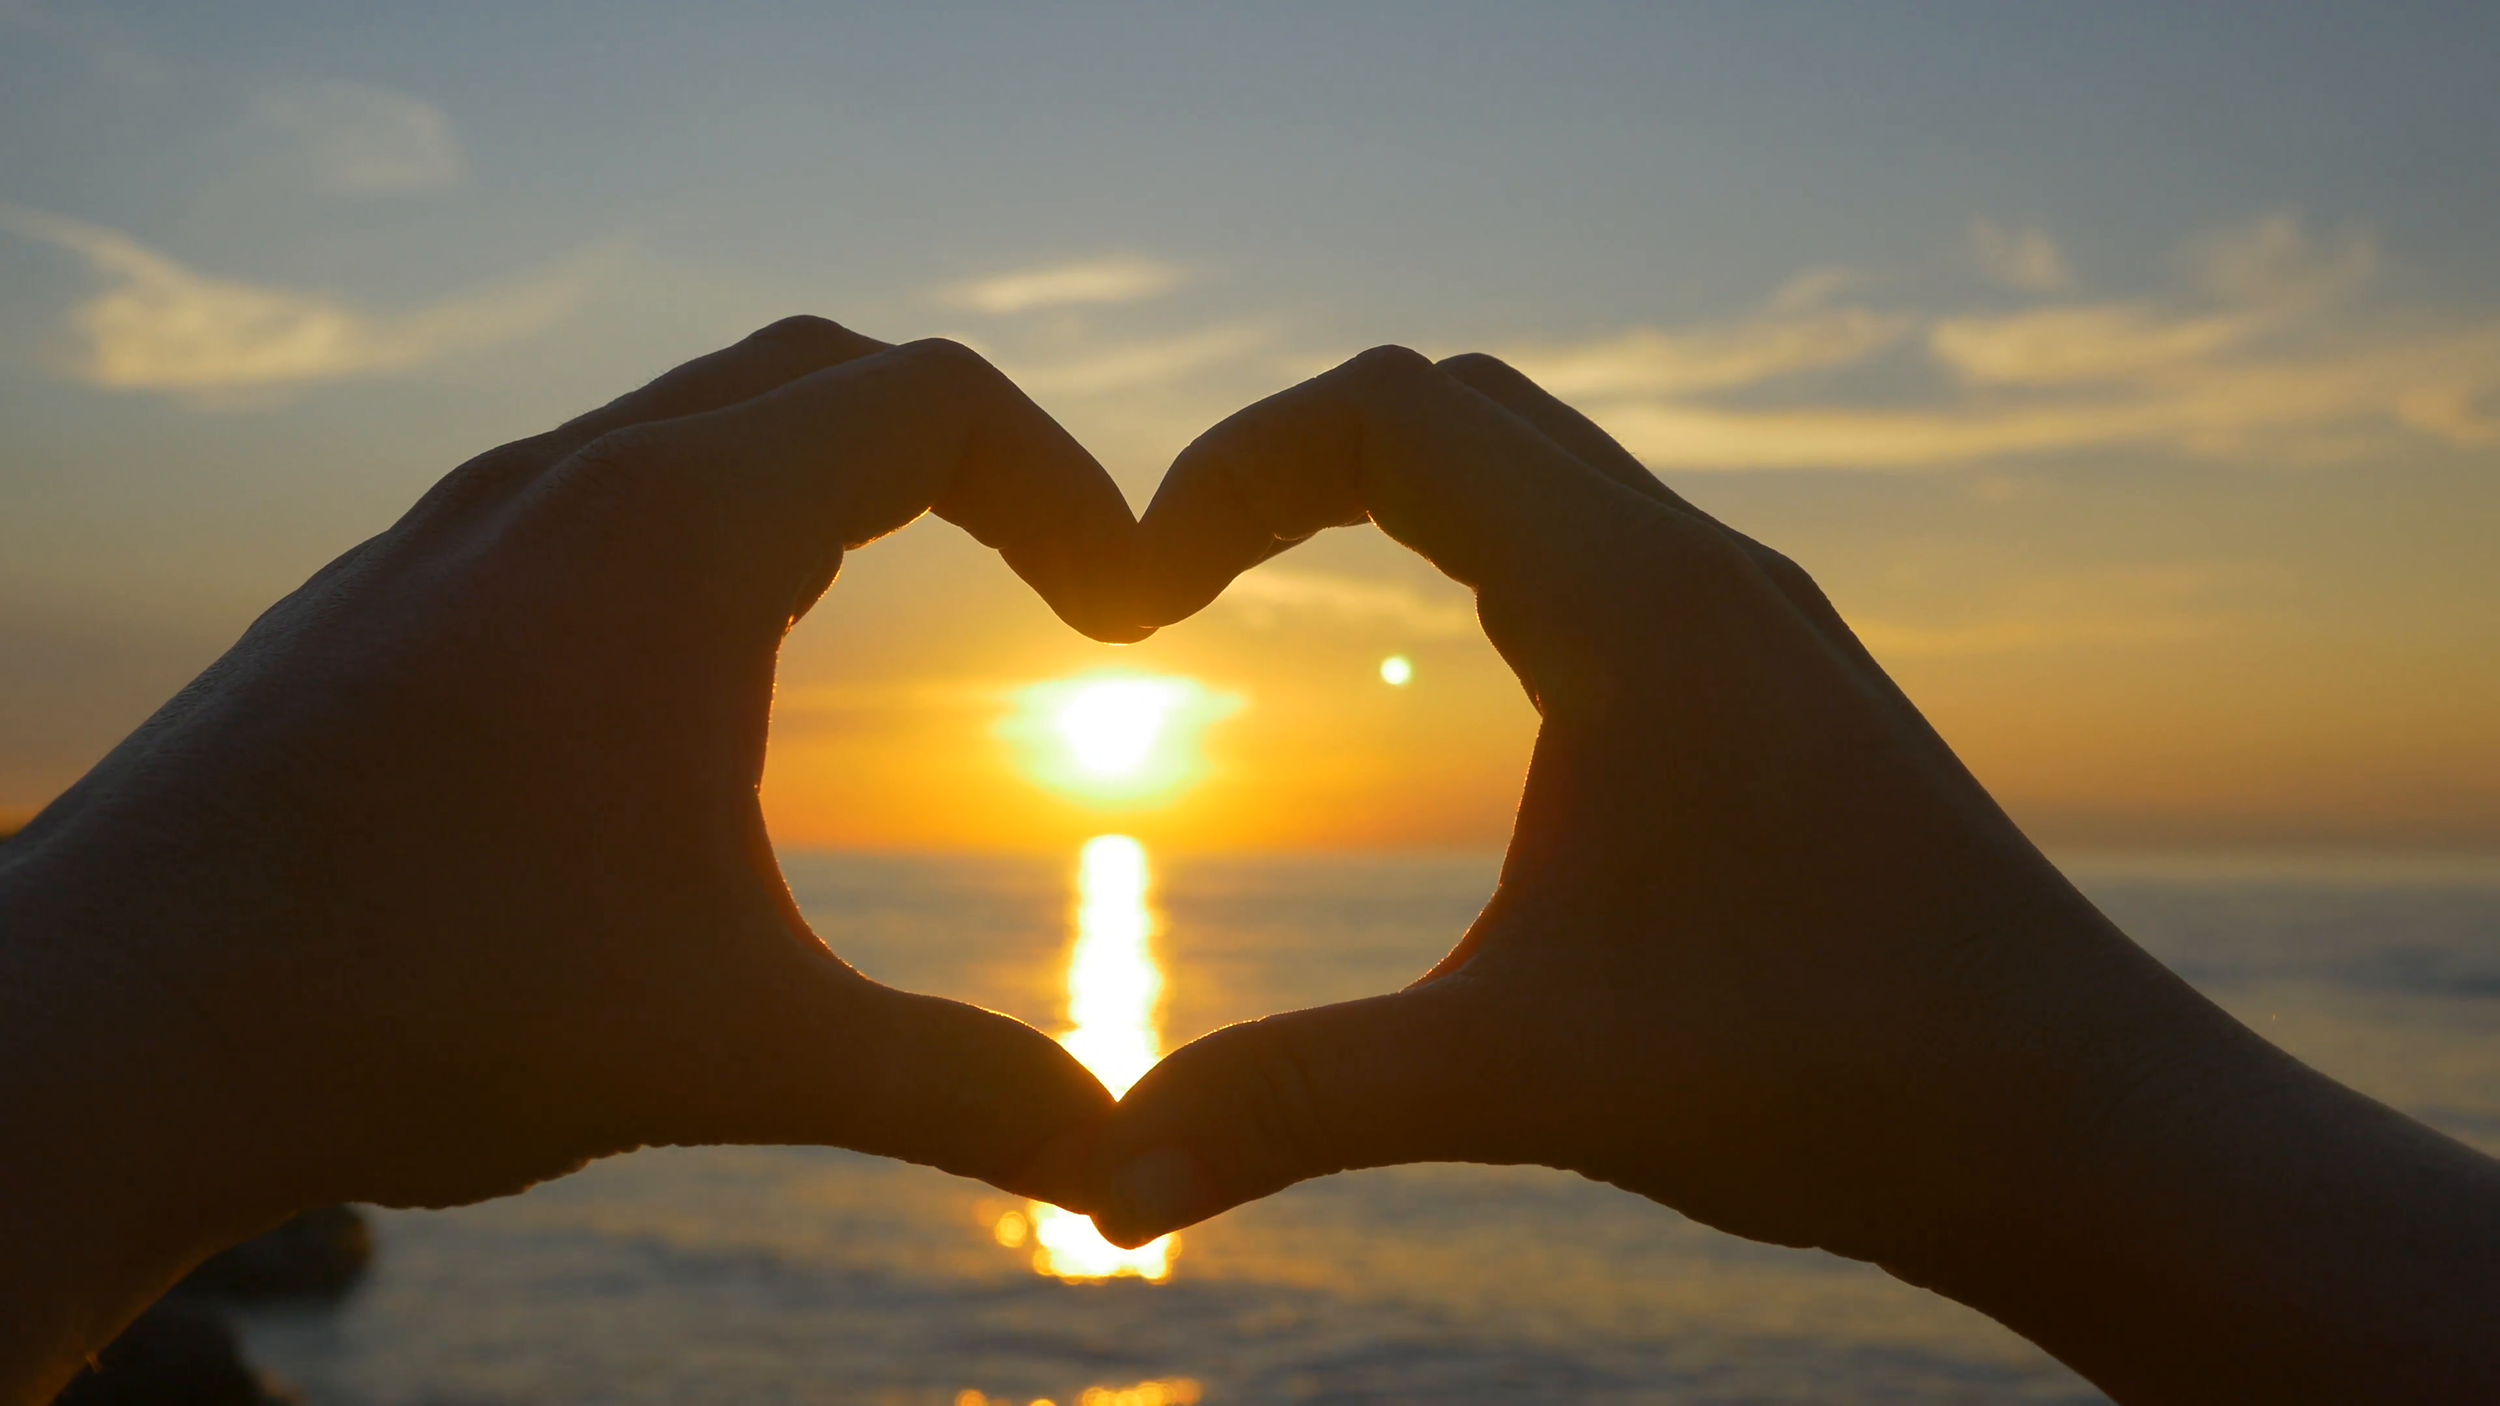 capturing-ocean-sunset-with-heart-shaped-hands_eytlelszl__F0000.png